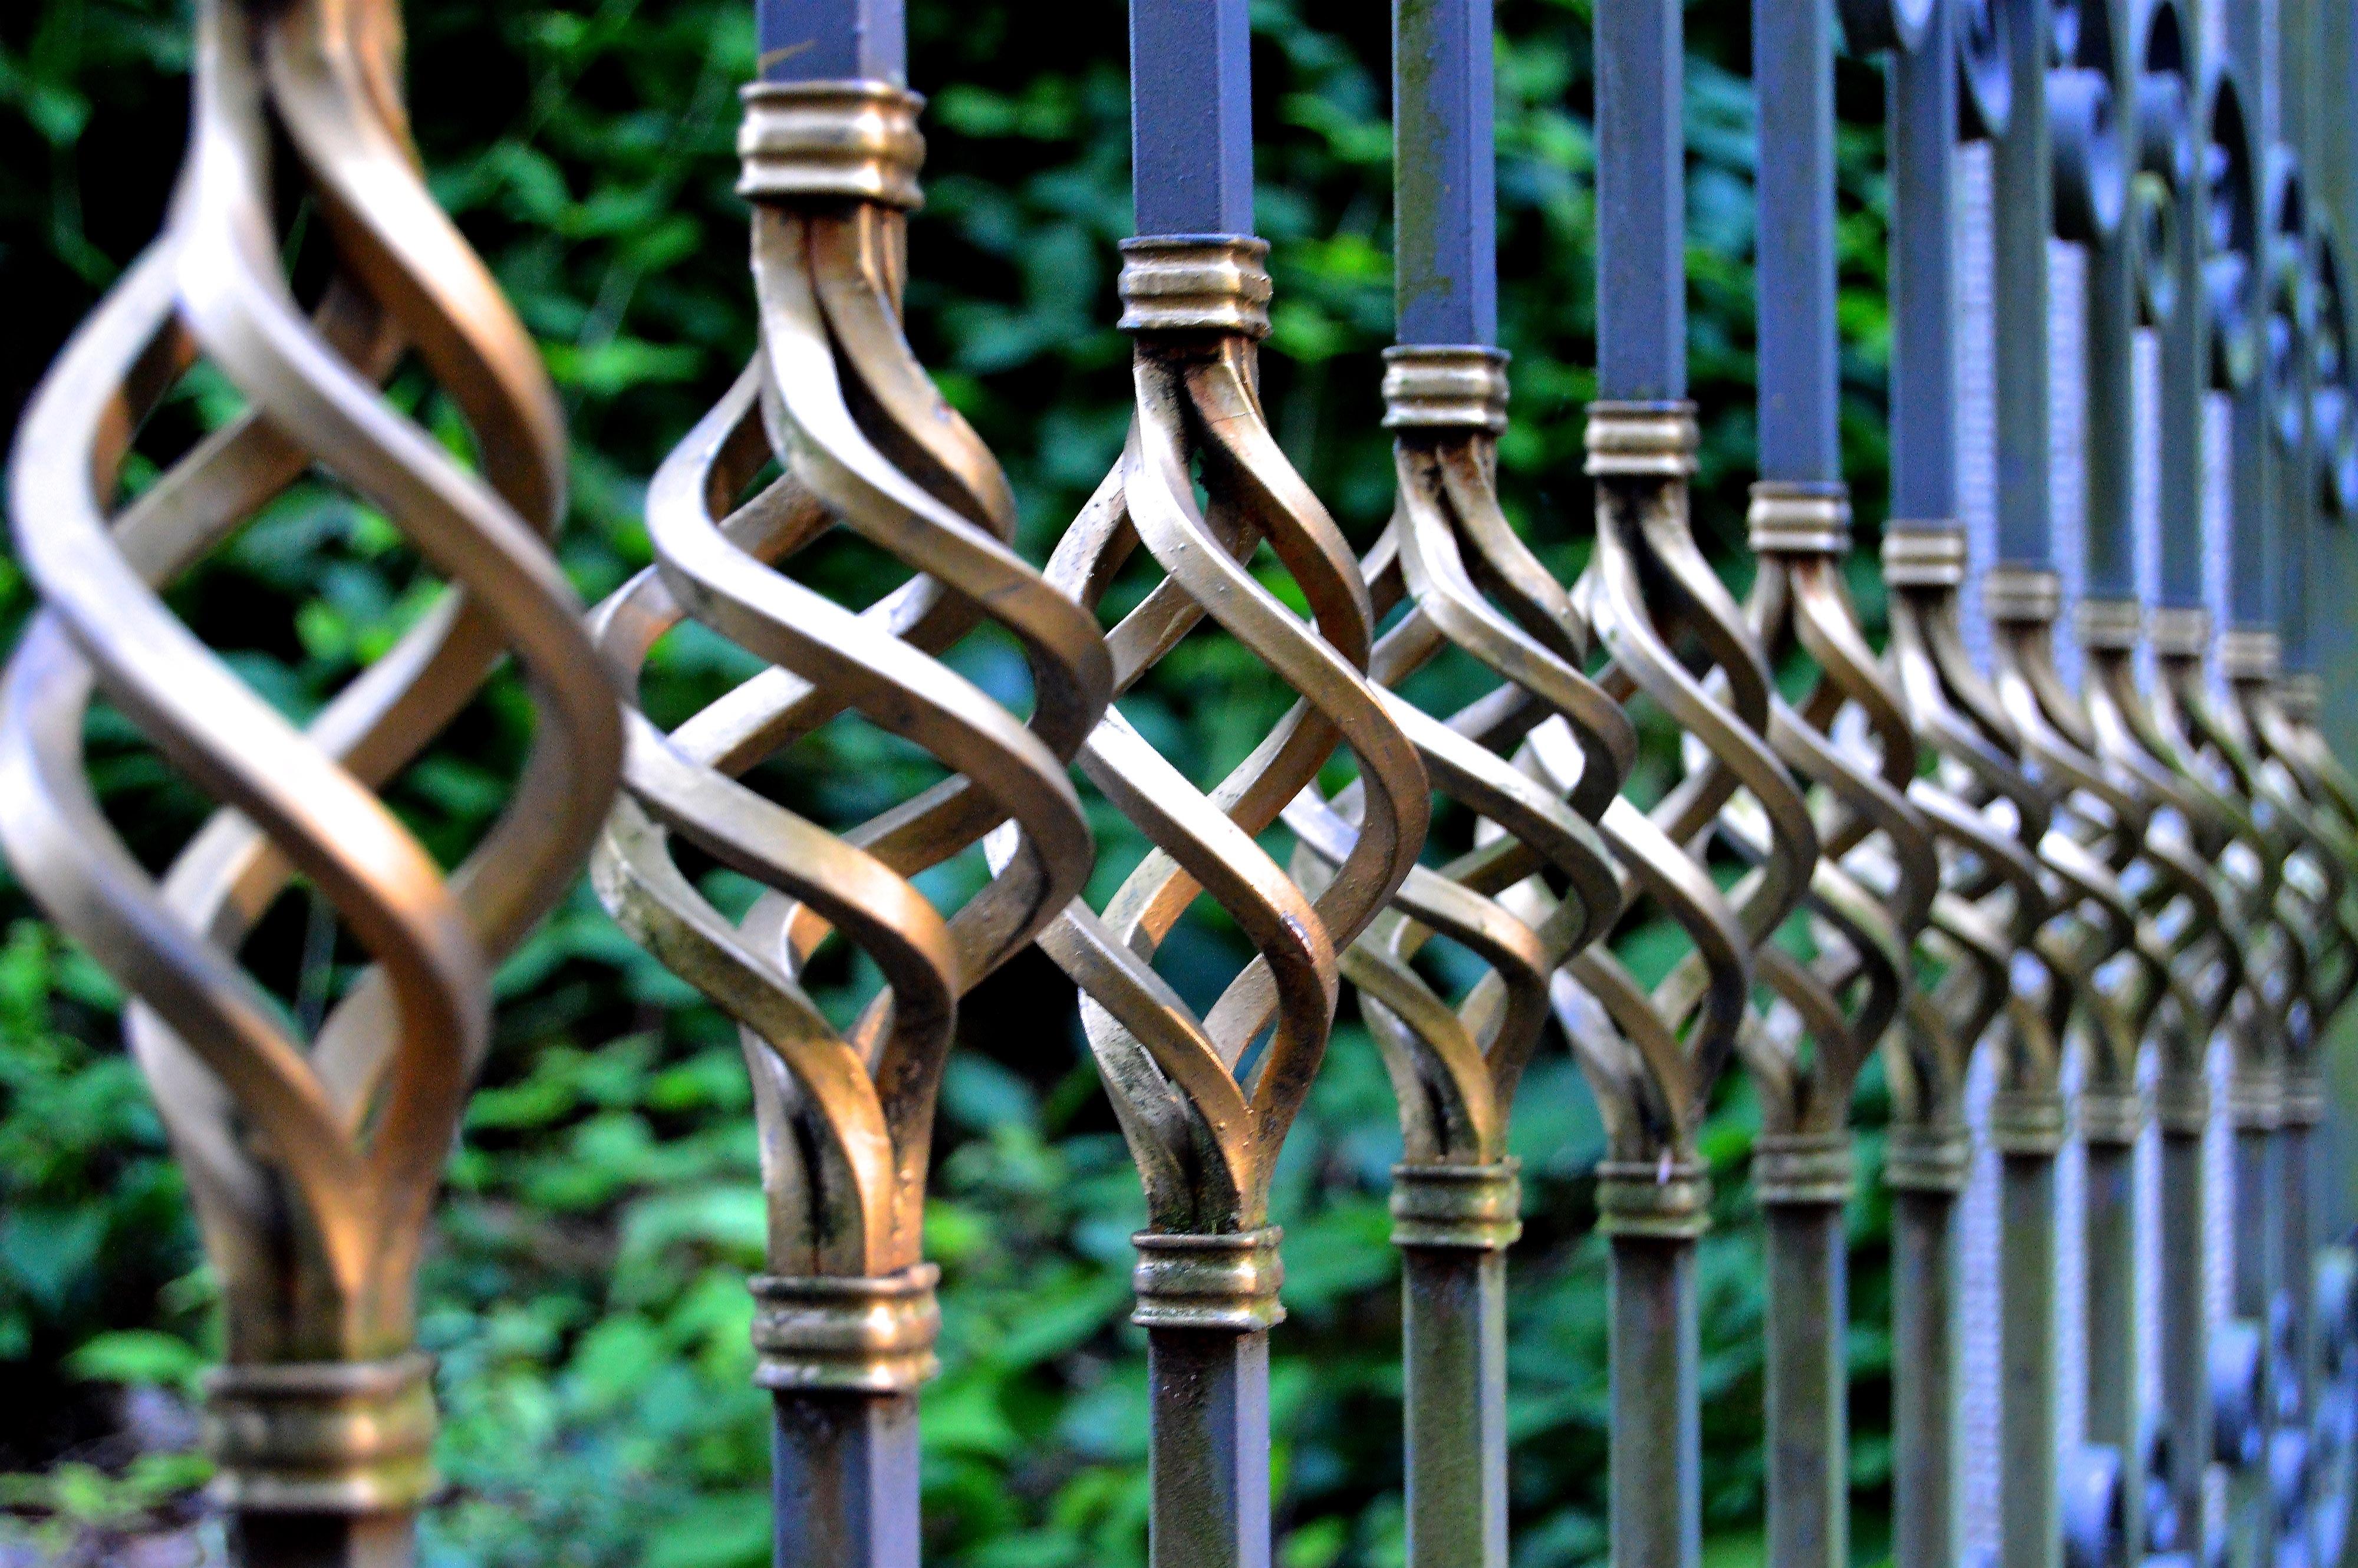 iron-gate-1623303